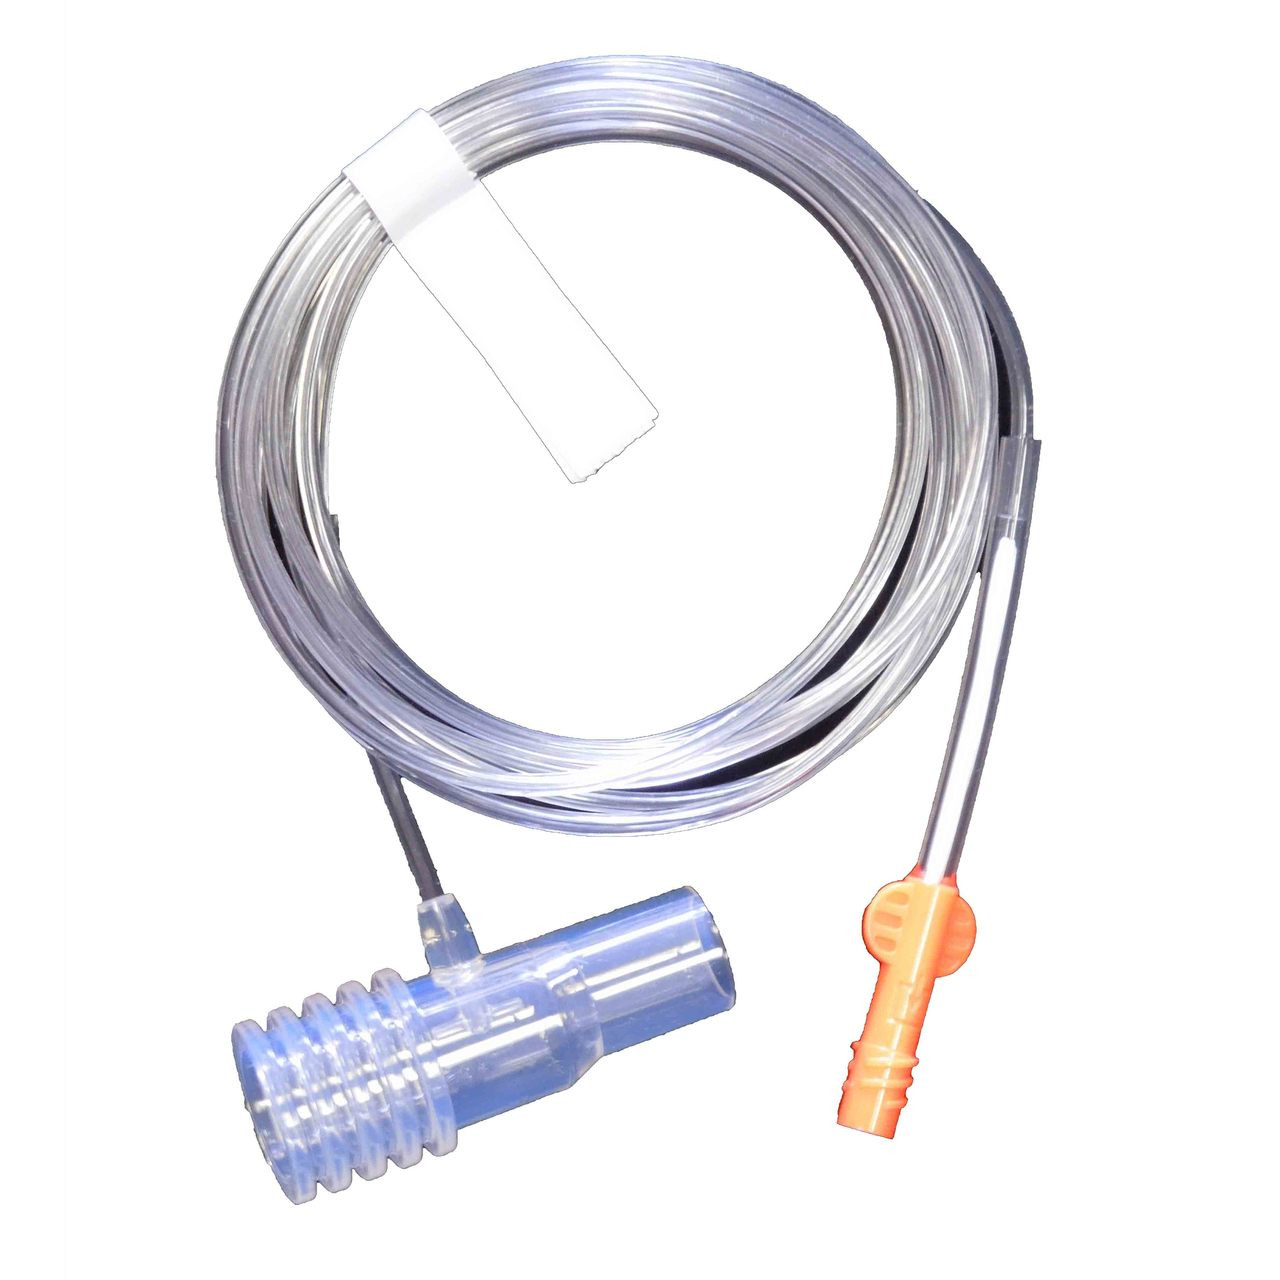 Philips Non-Intubated EtCO2 Circuits - Adult